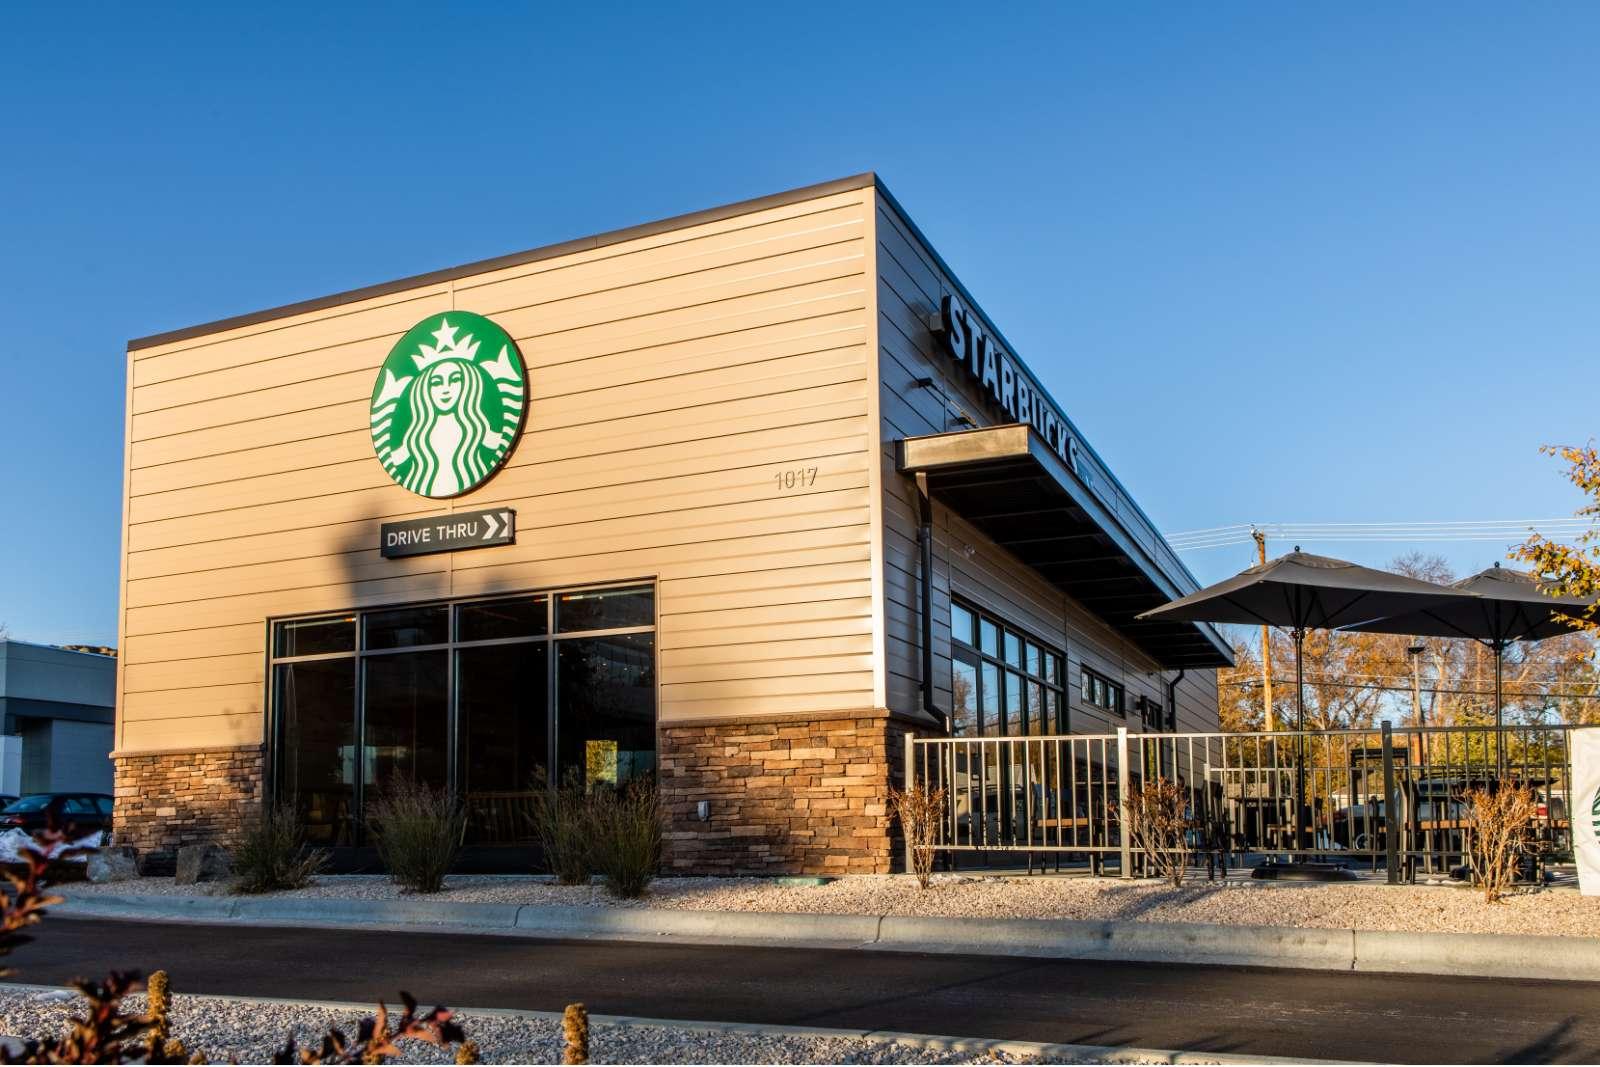 CWG - Starbucks Billings (3 of 5)